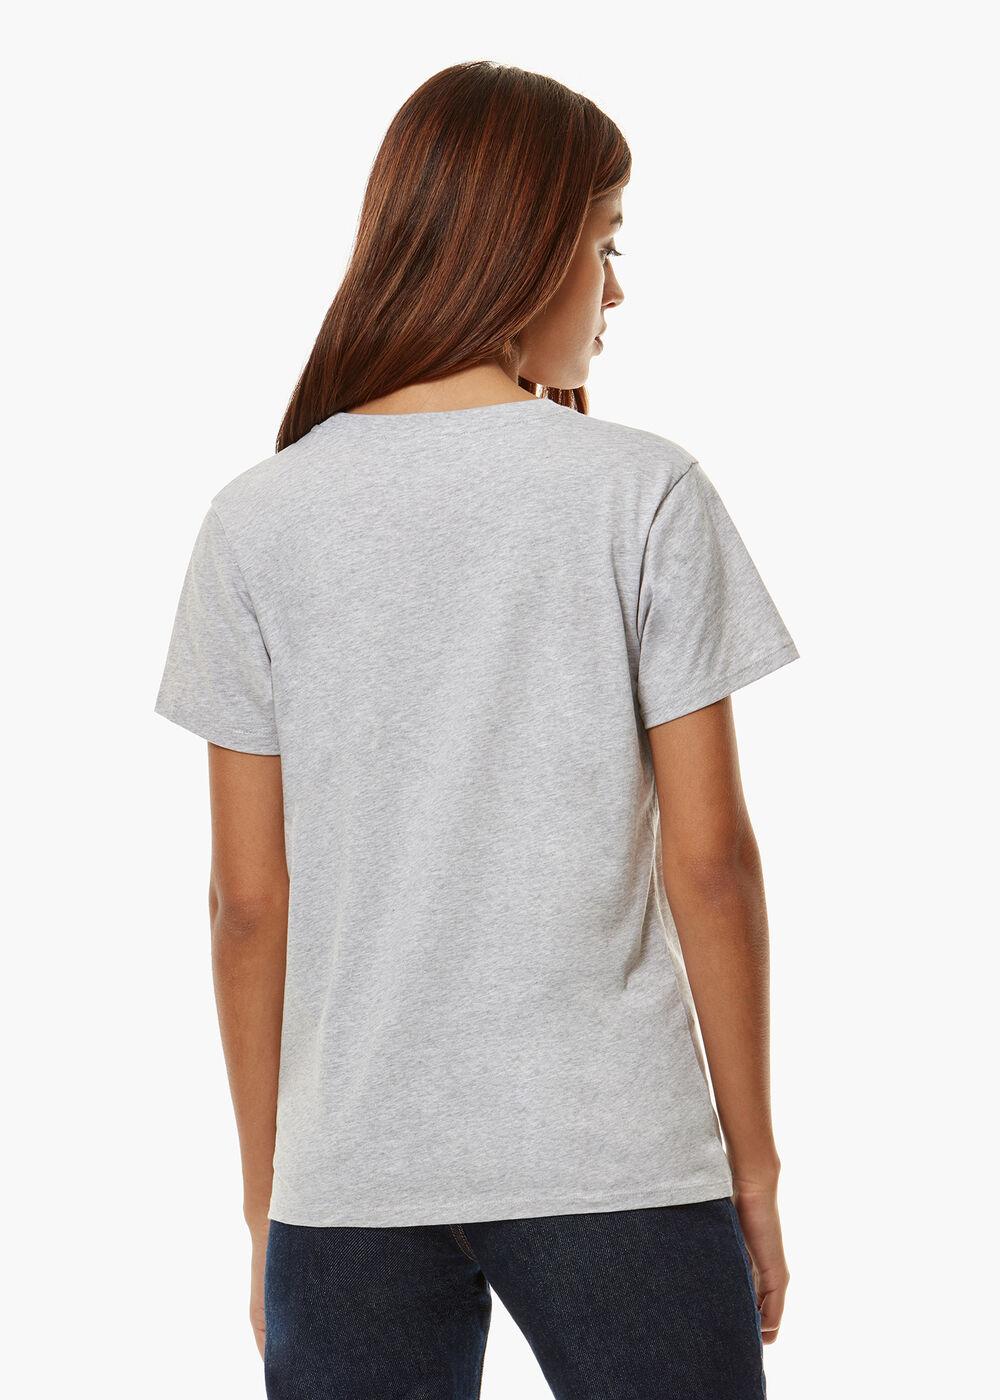 Angels T-Shirt Heather Grey